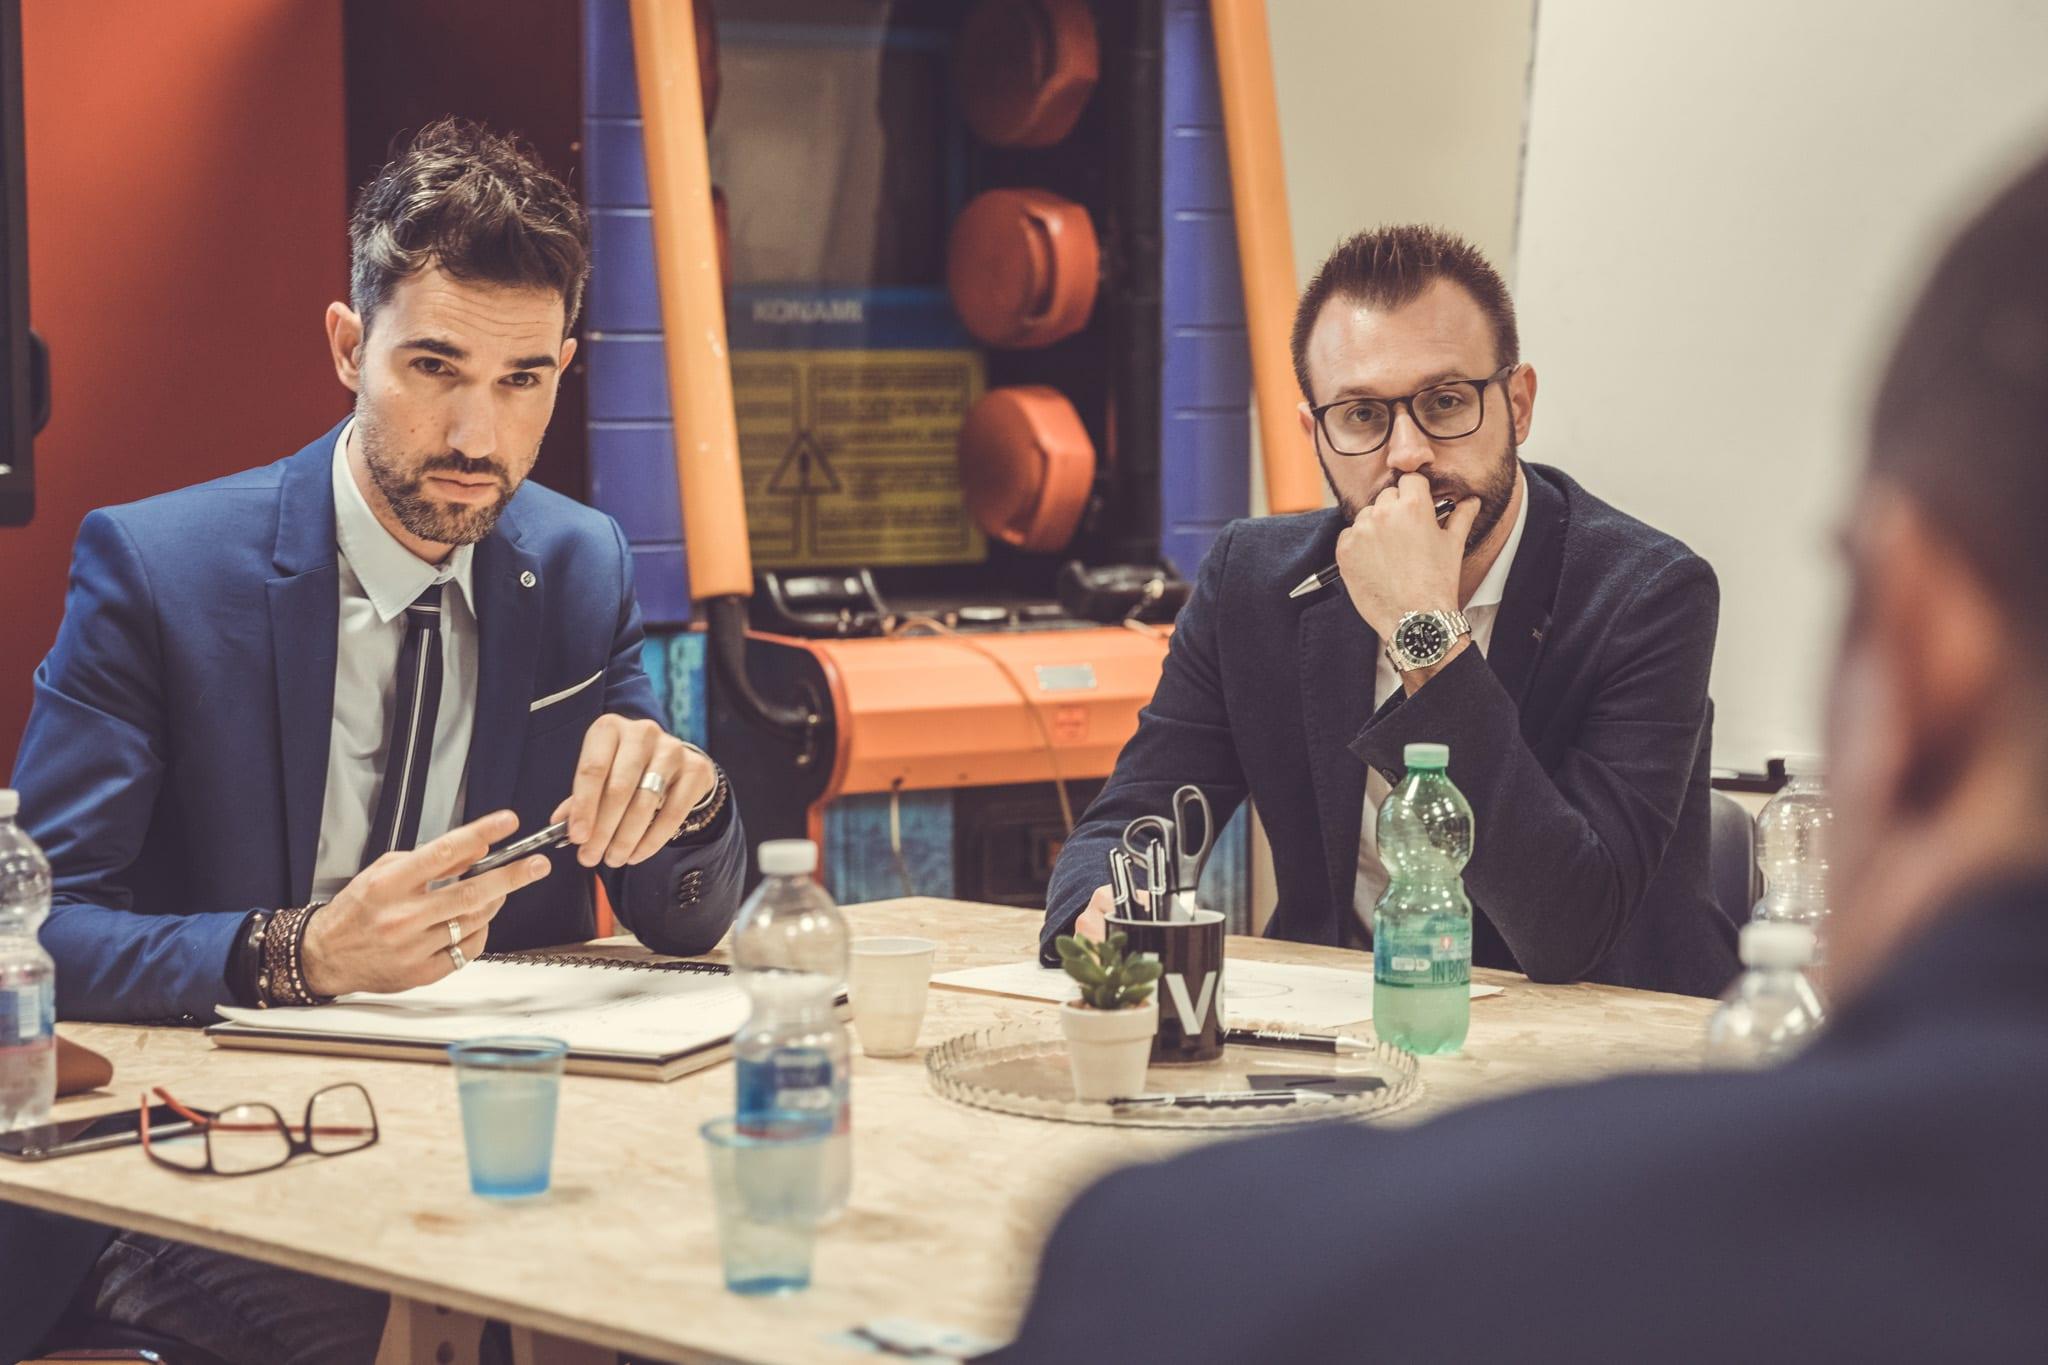 Vendere online con l'agenzia Velvet Media Italia